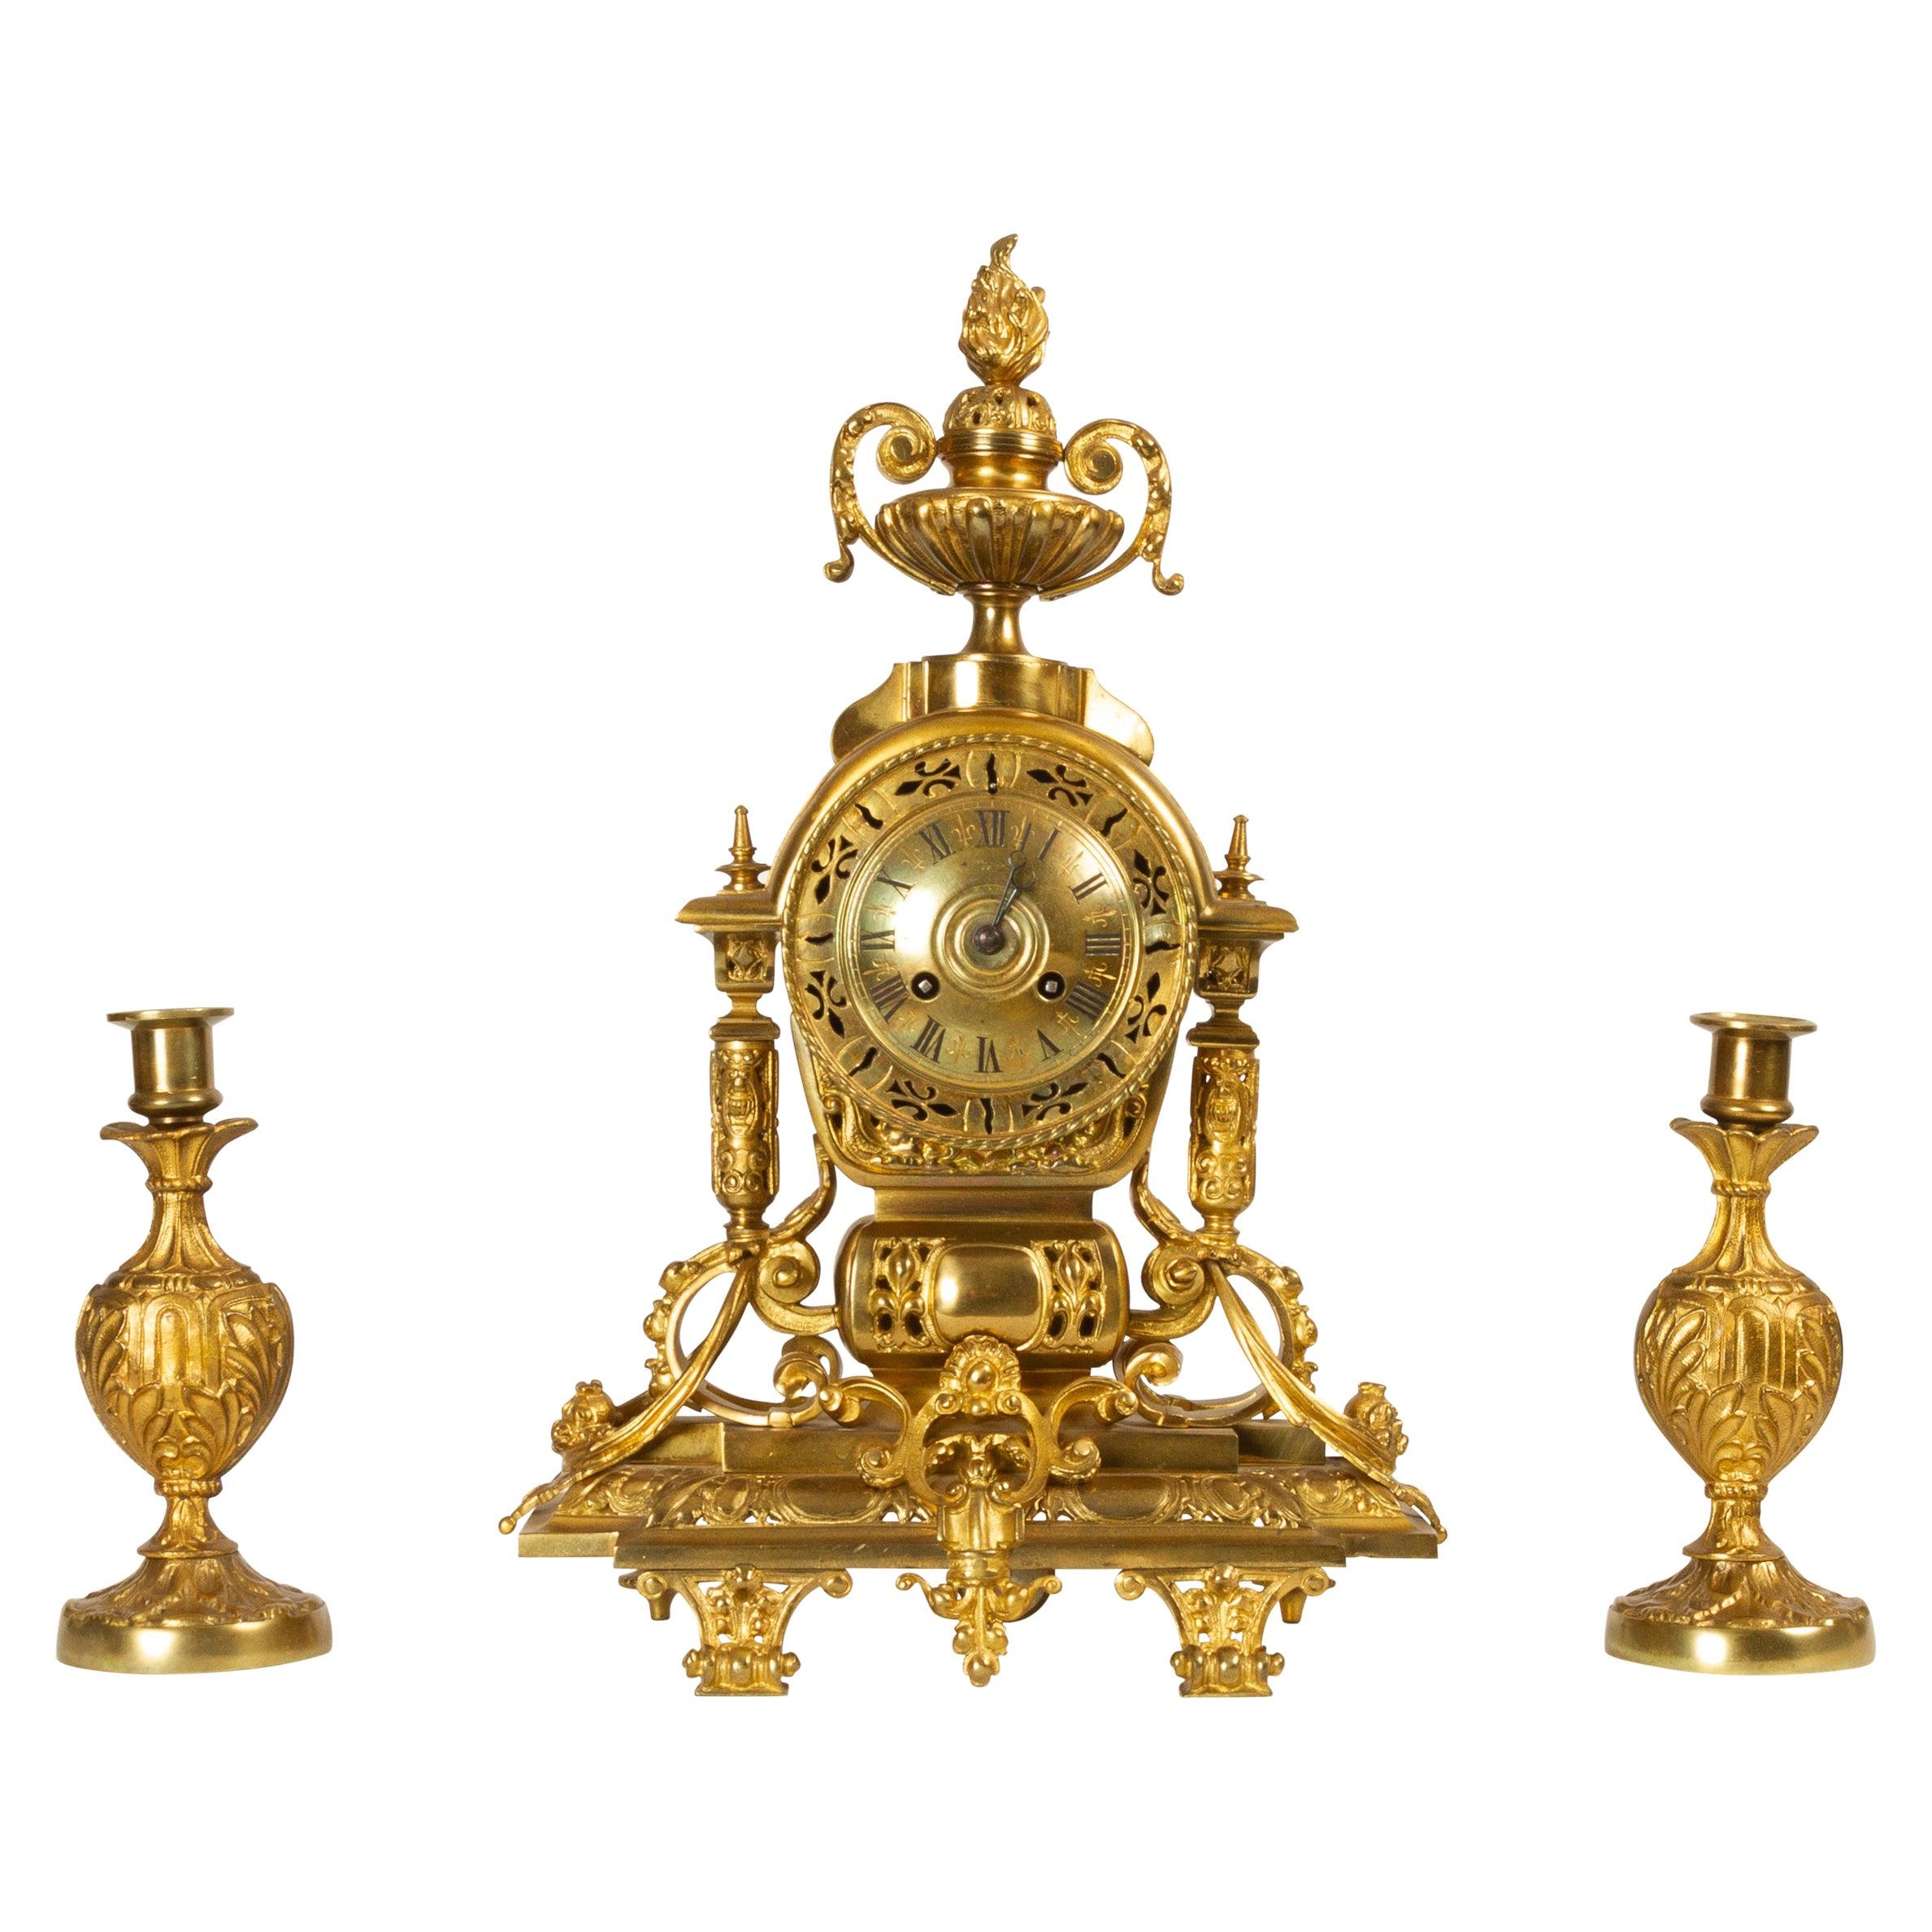 French Louis XVI Gilt Clock Set by Japy Fréres, 1880s